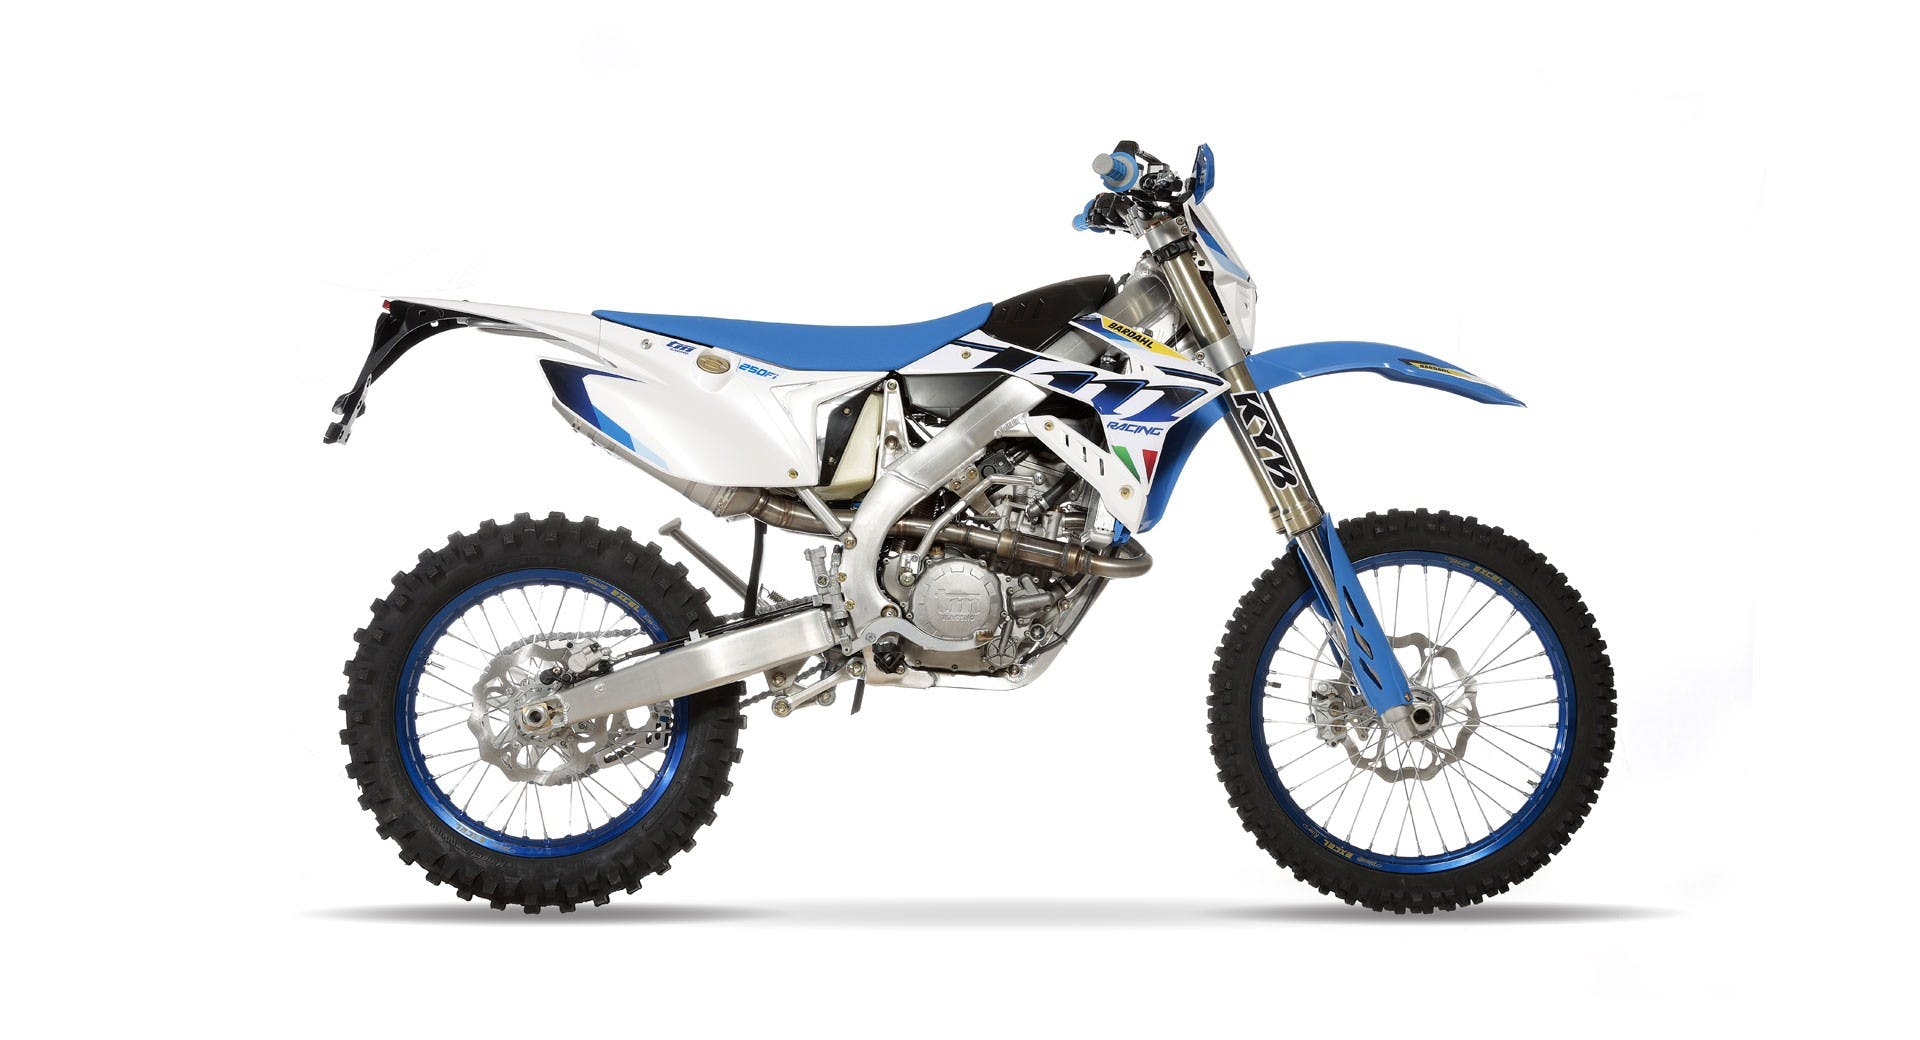 Tm EN 250 Fi 4T Migliori moto da enduro 2021